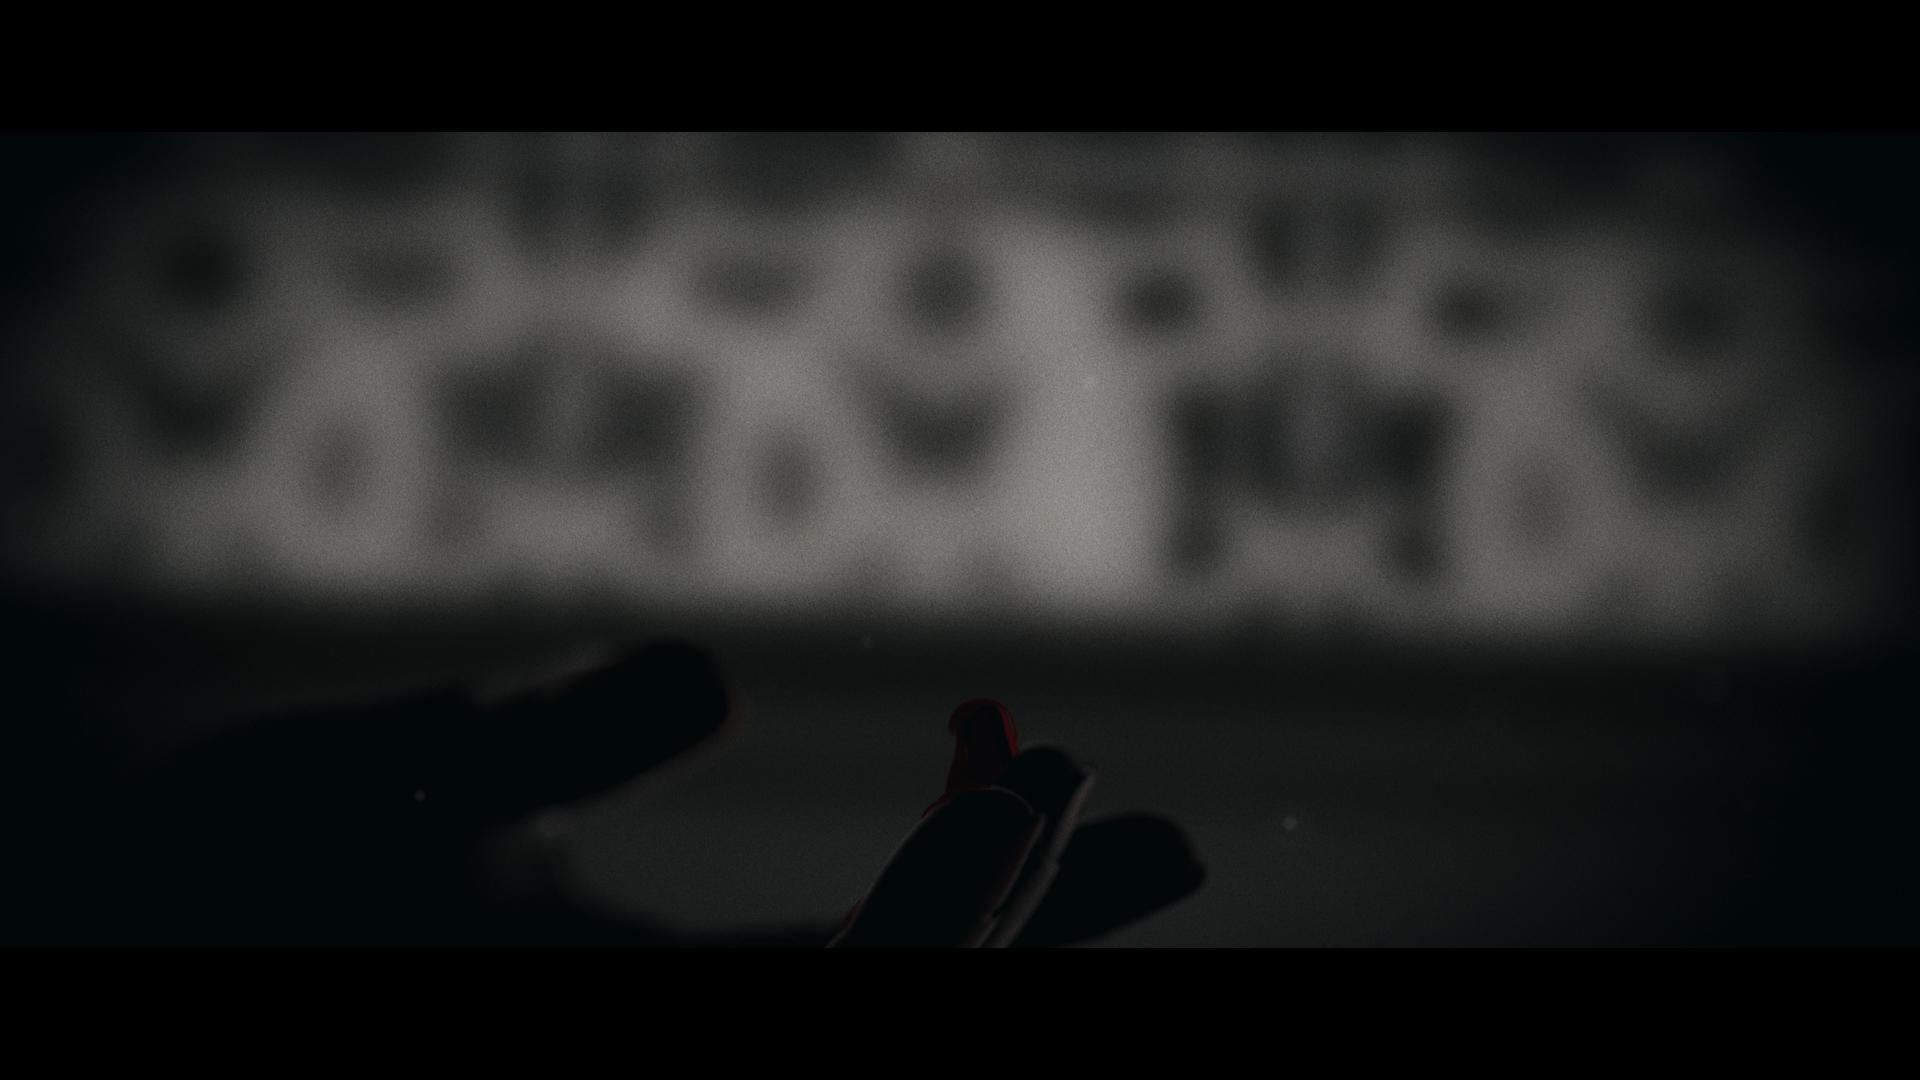 CG Sequence